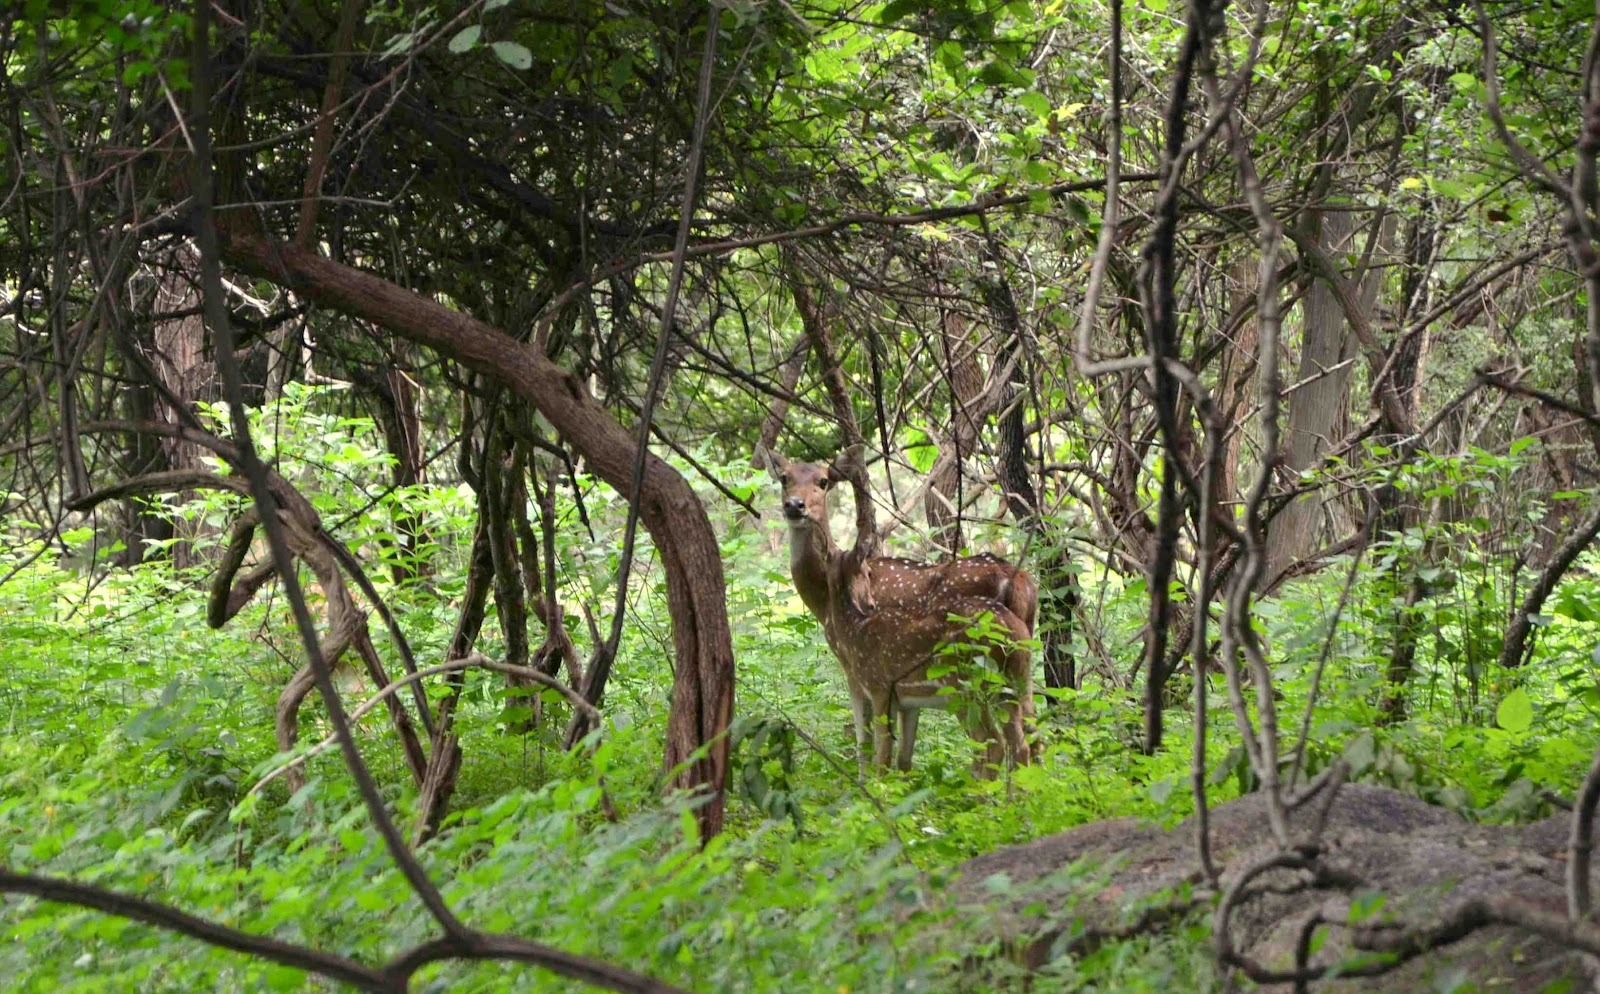 Balphakram National Park, Meghalaya, North East India